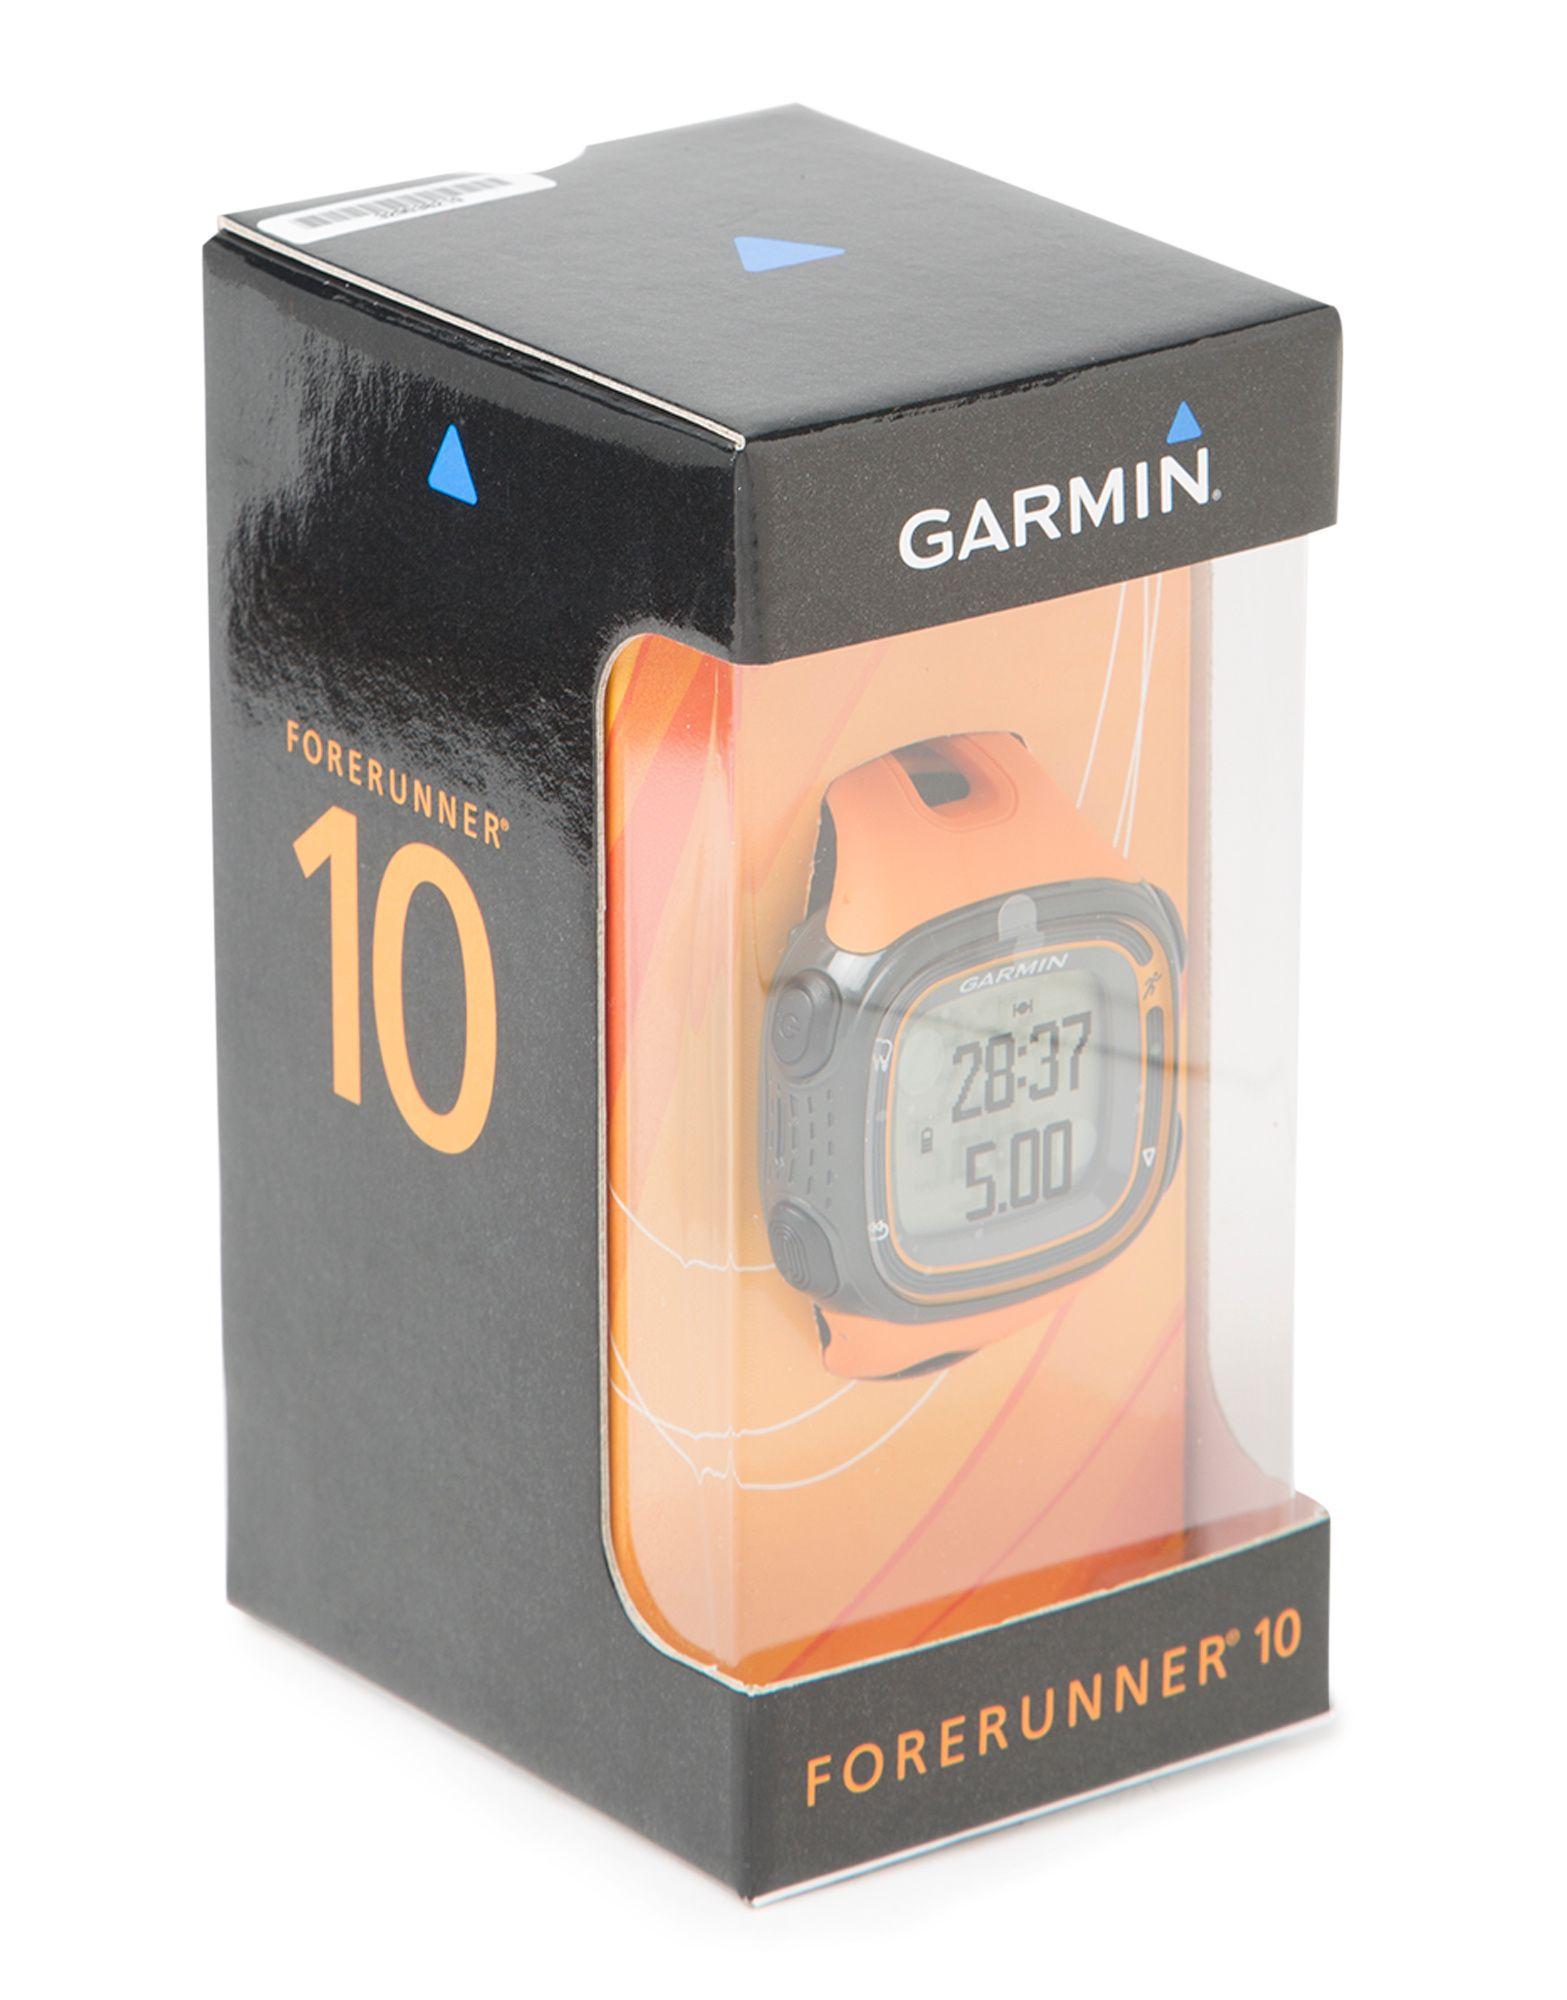 Garmin Forerunner 10 GPS Sports Watch